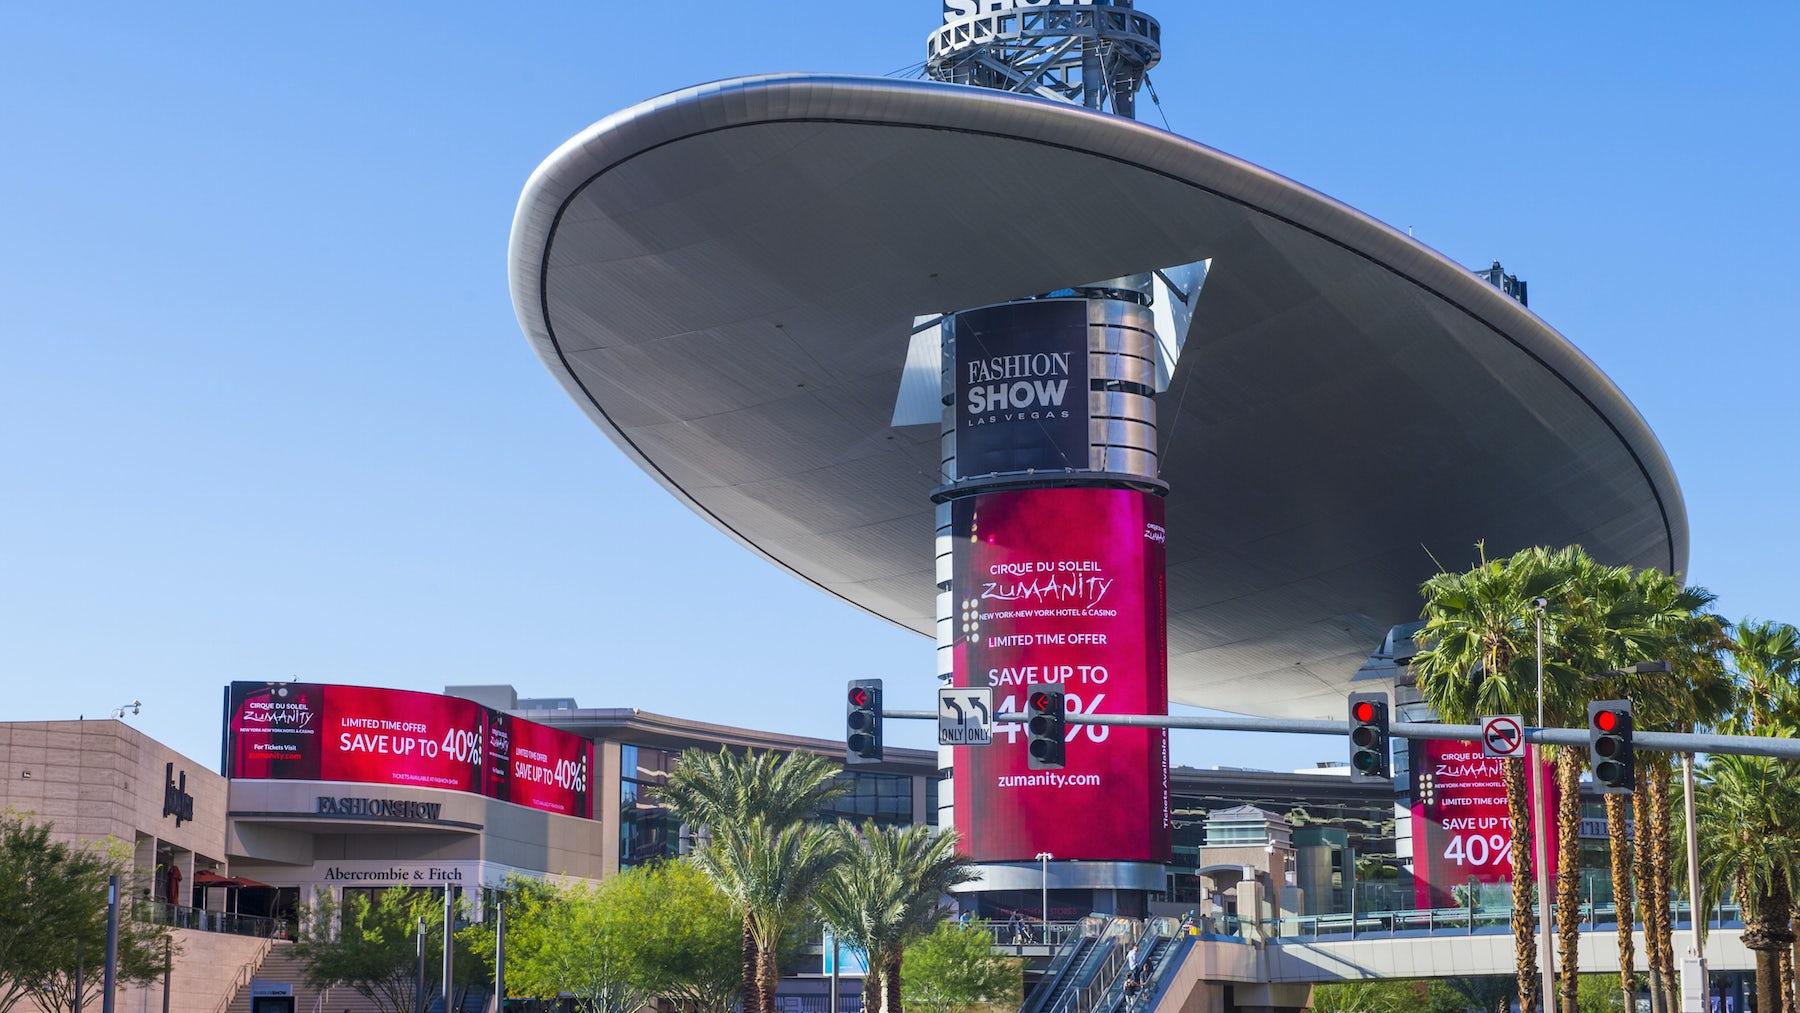 Fashion Show Mall, Las Vegas | Source: Shutterstock